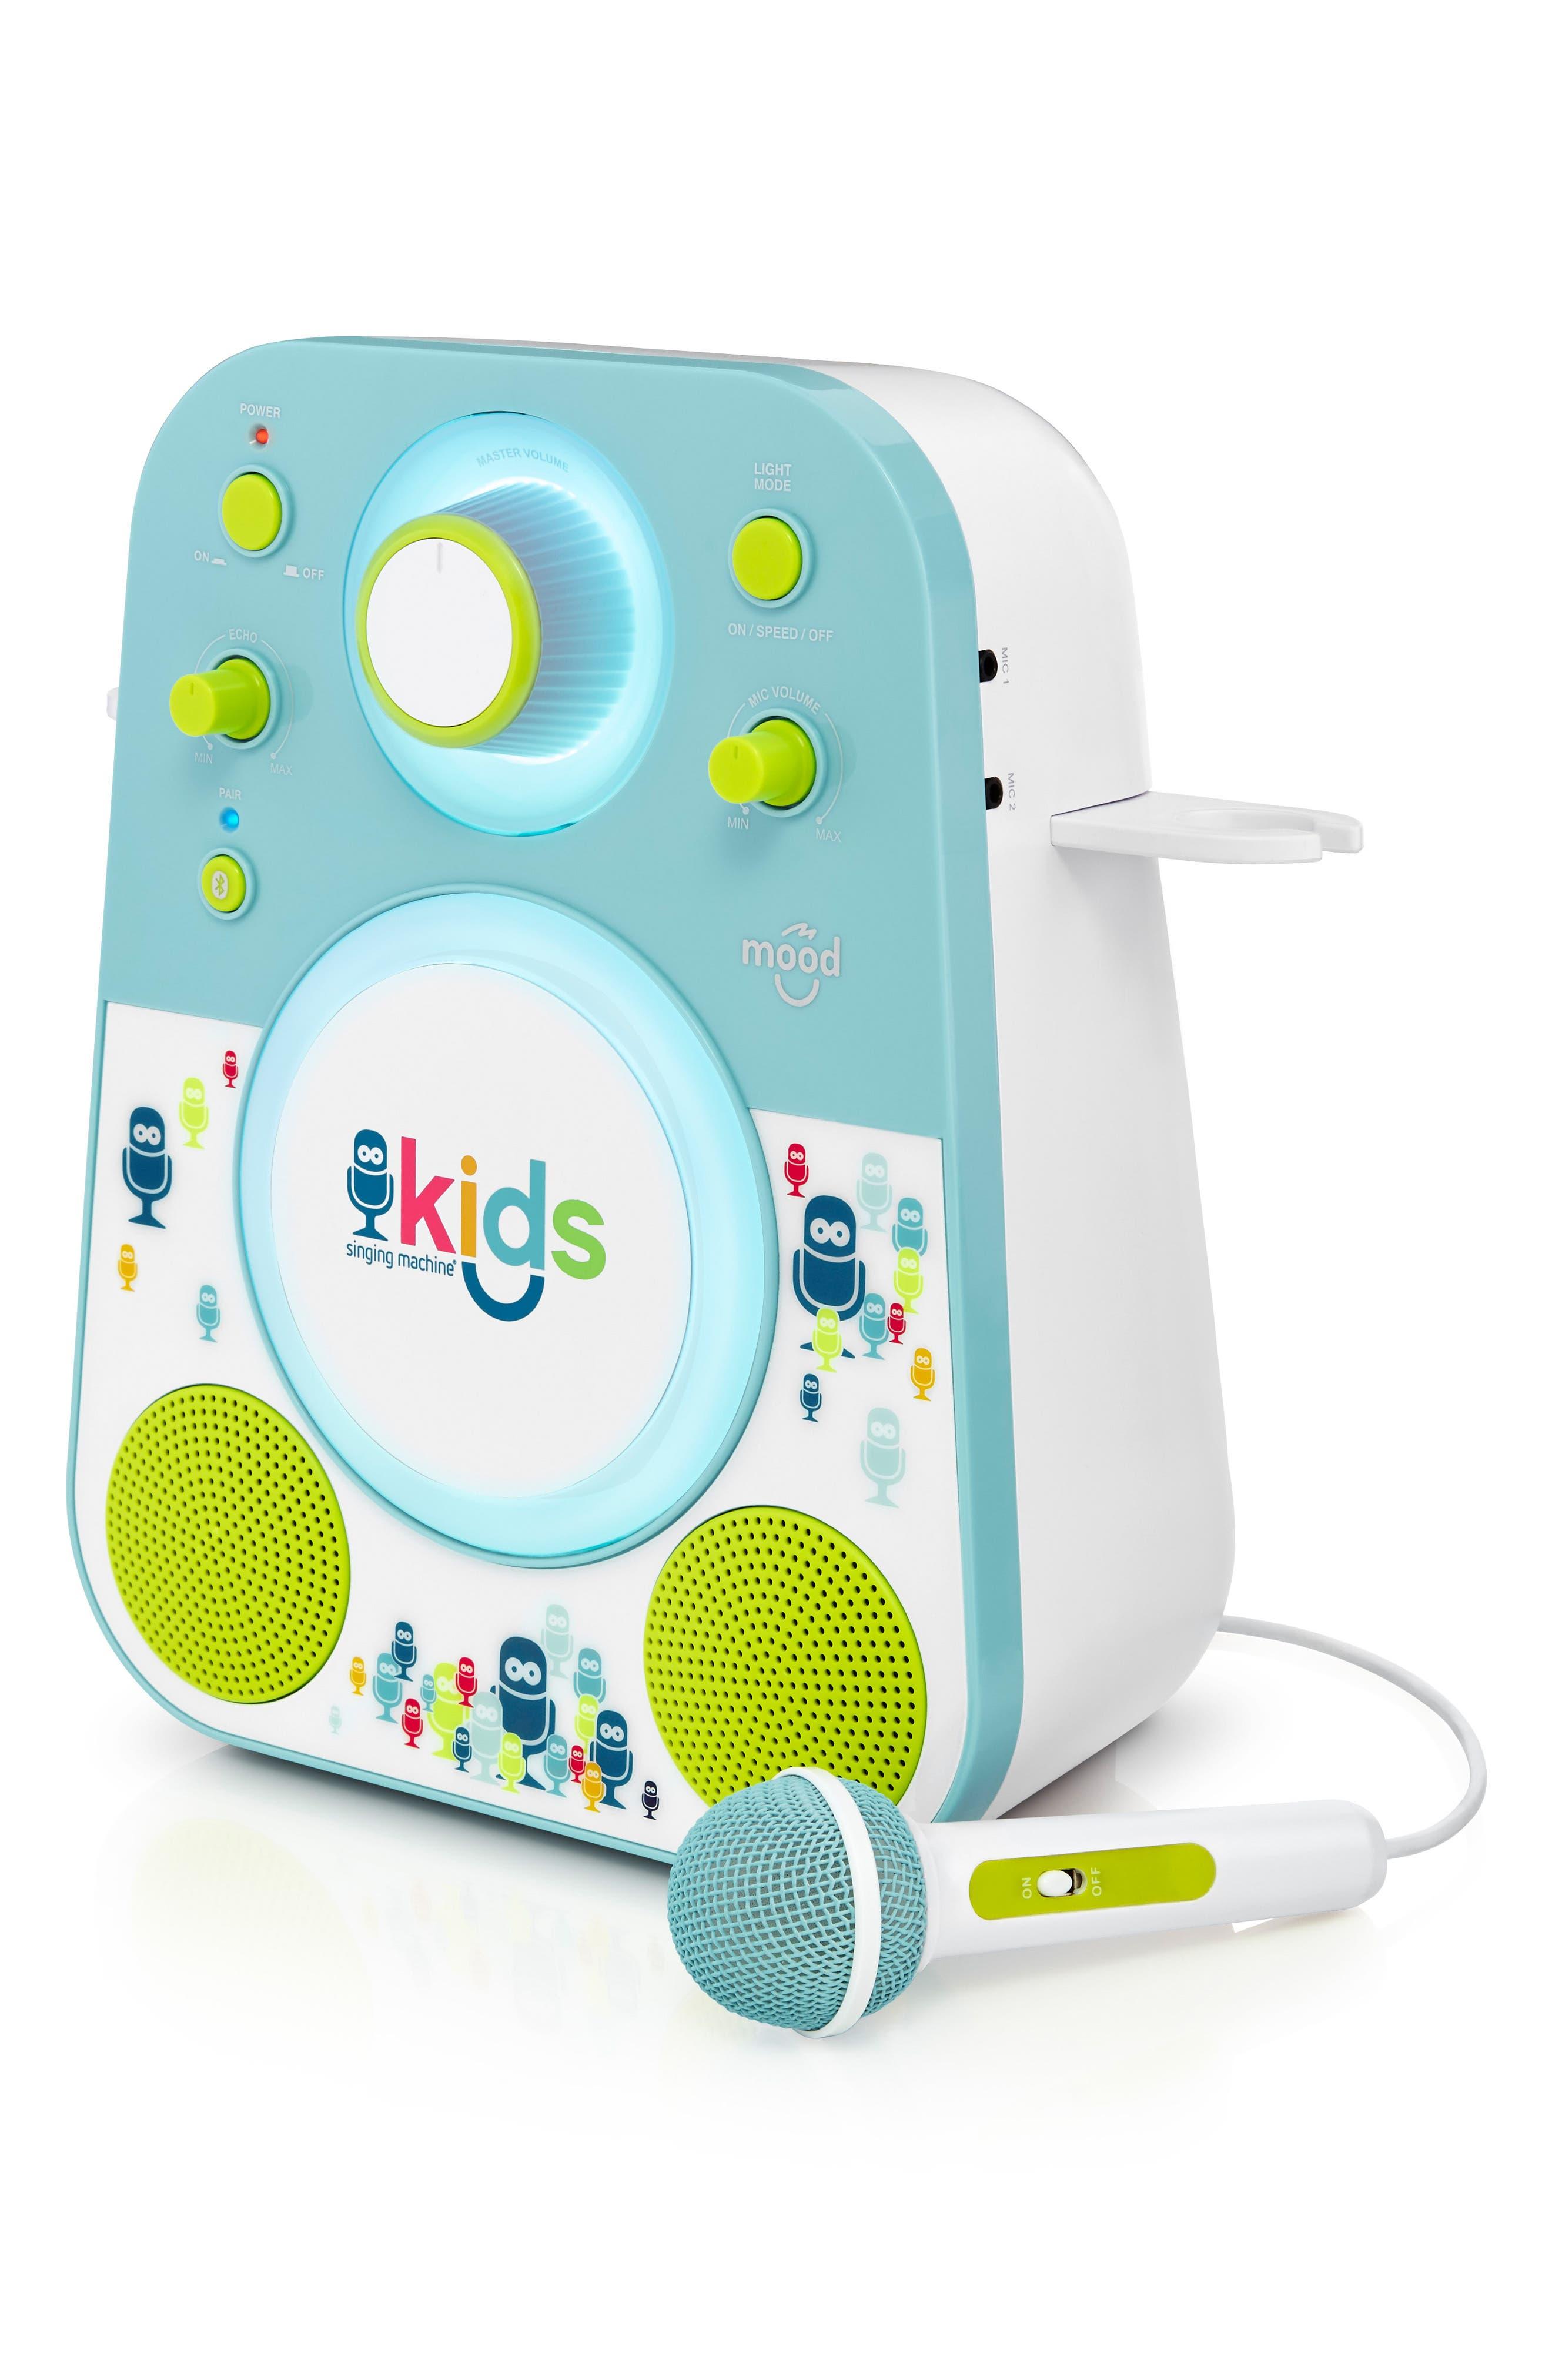 Kids Mood Karaoke System,                             Alternate thumbnail 7, color,                             BLUE GREEN